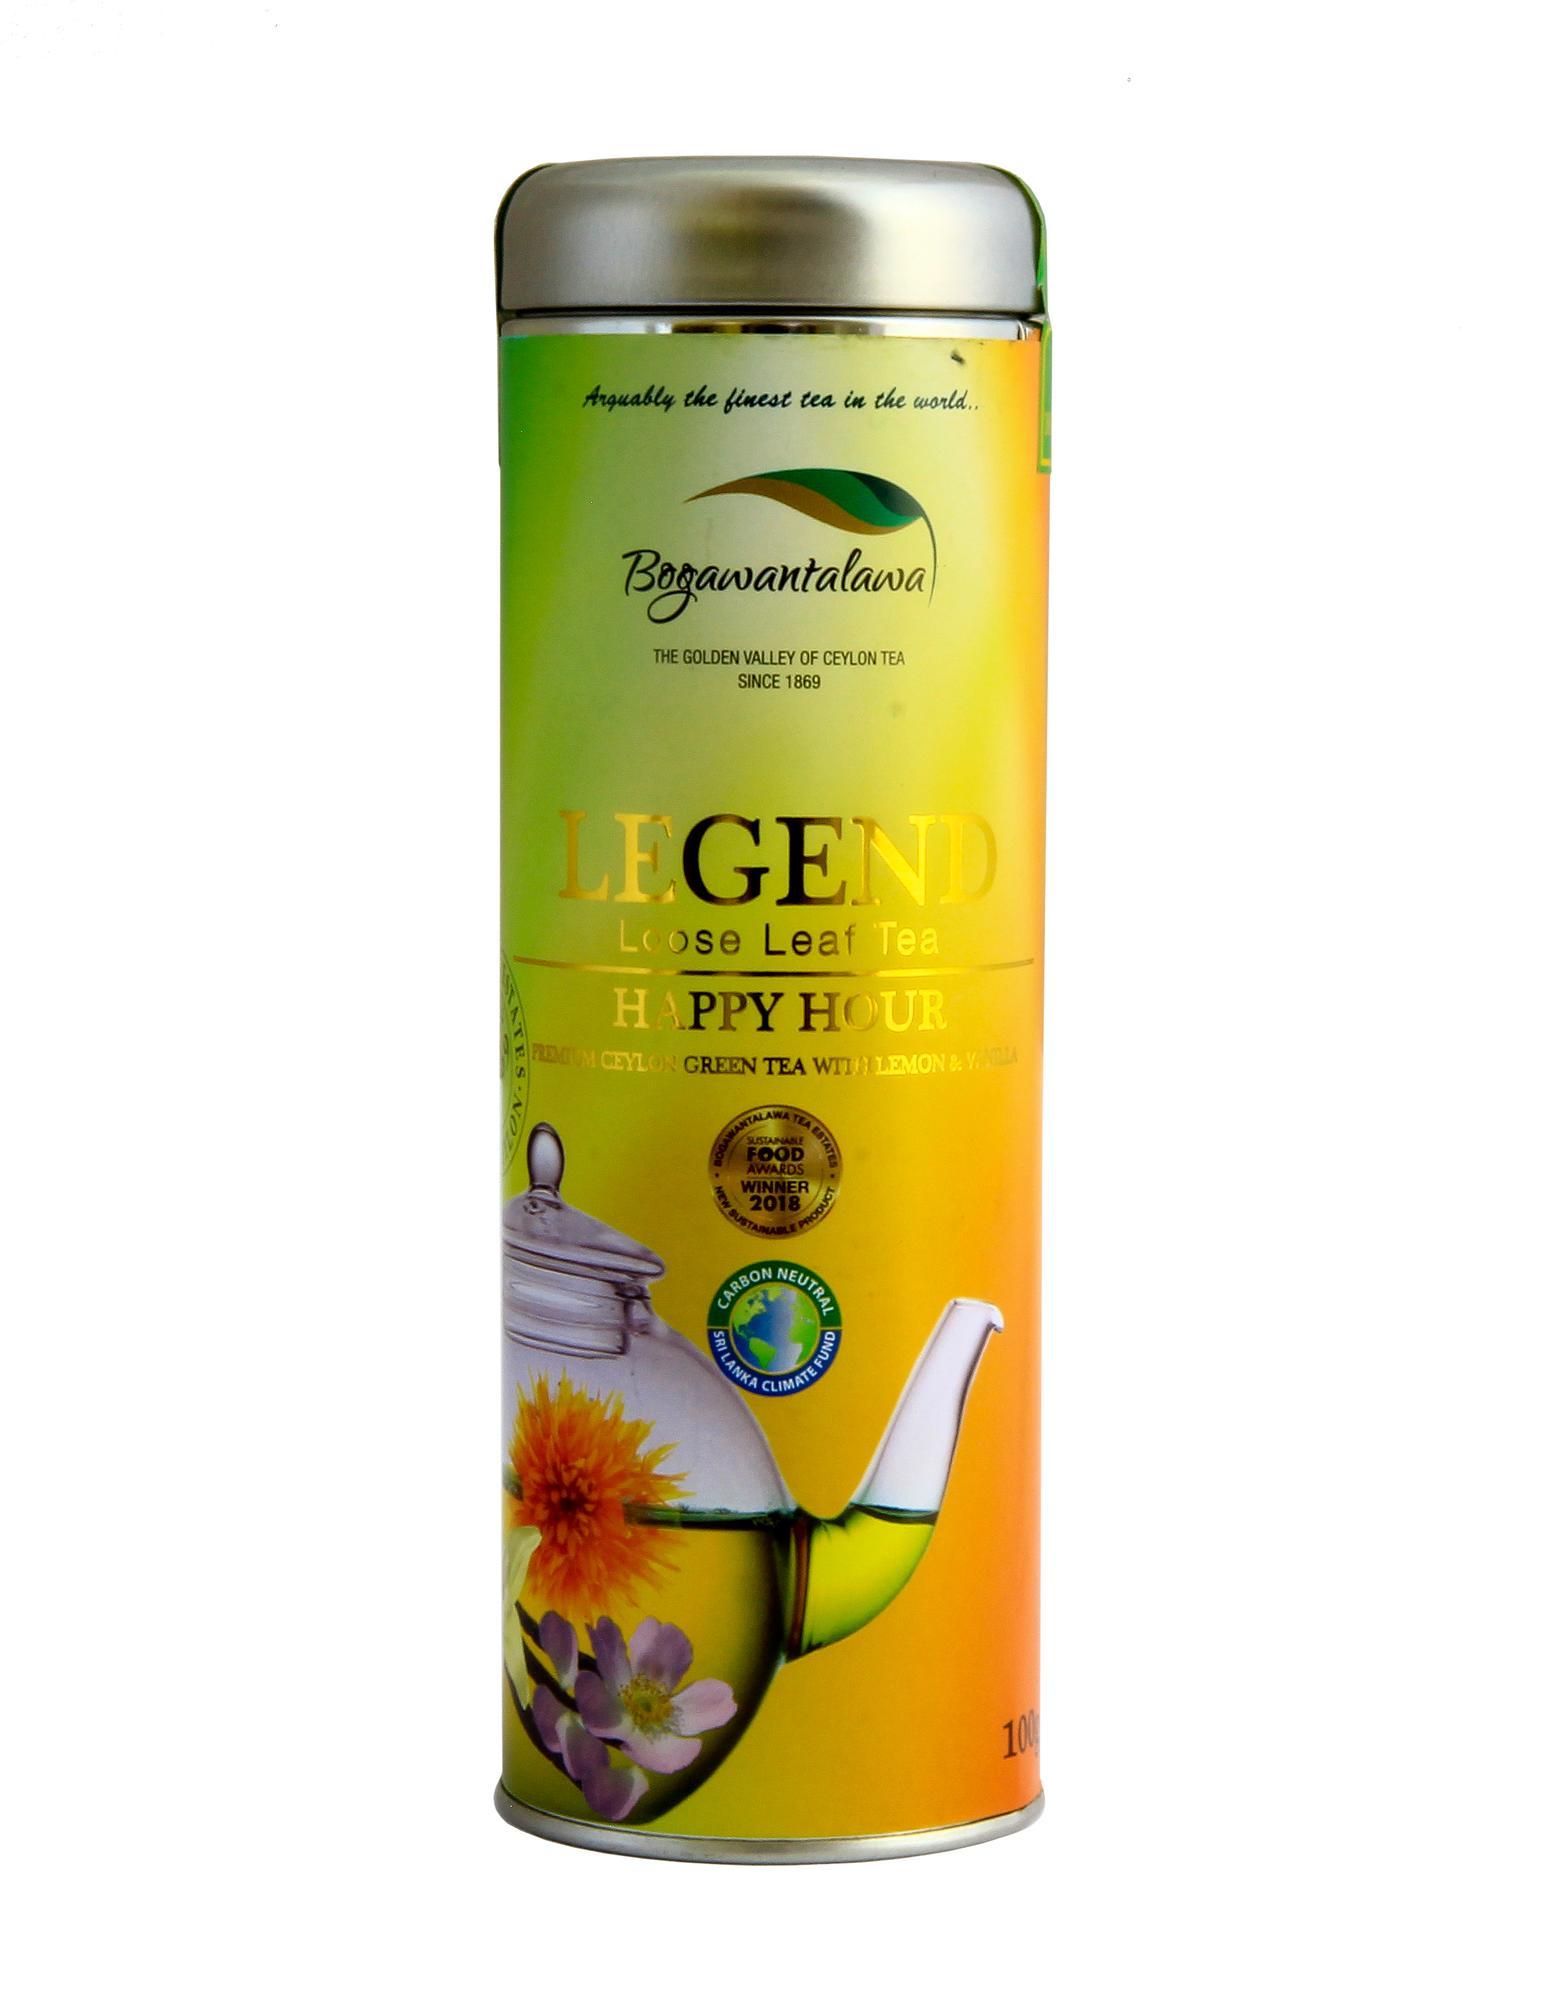 Herbata zielona cejlońska sencha liściasta Happy Hour - naturalneherbaty